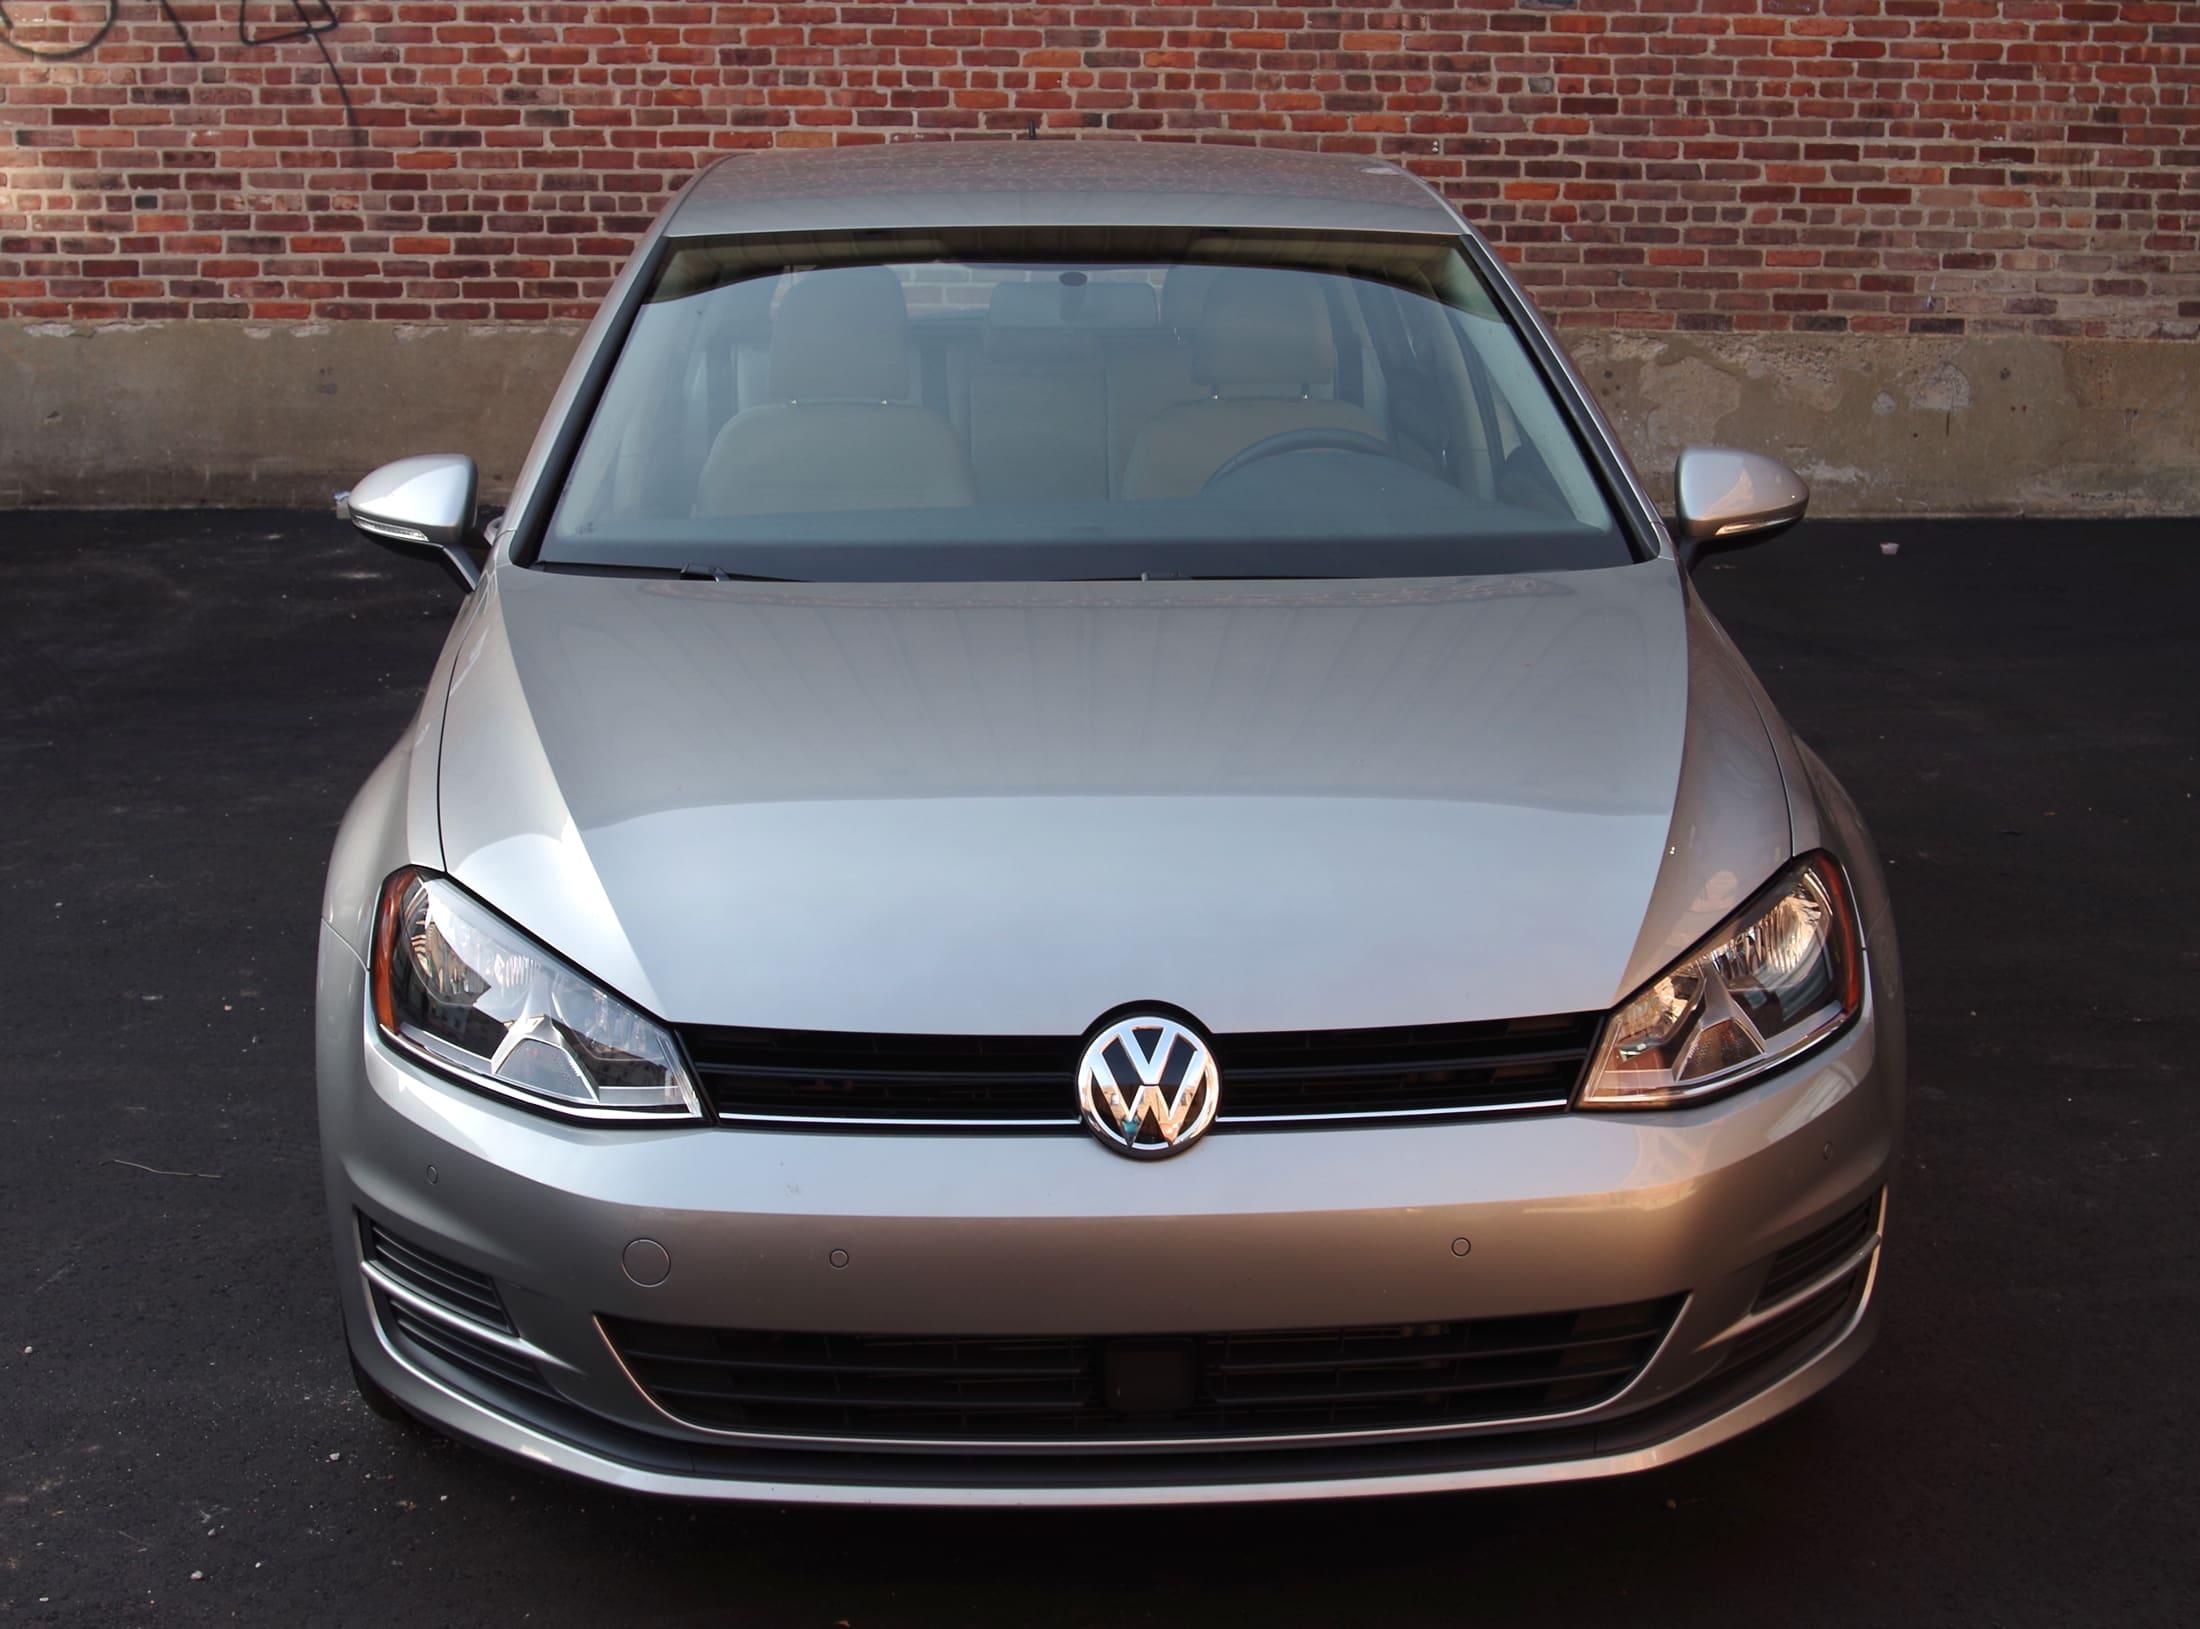 2015 VW Golf front